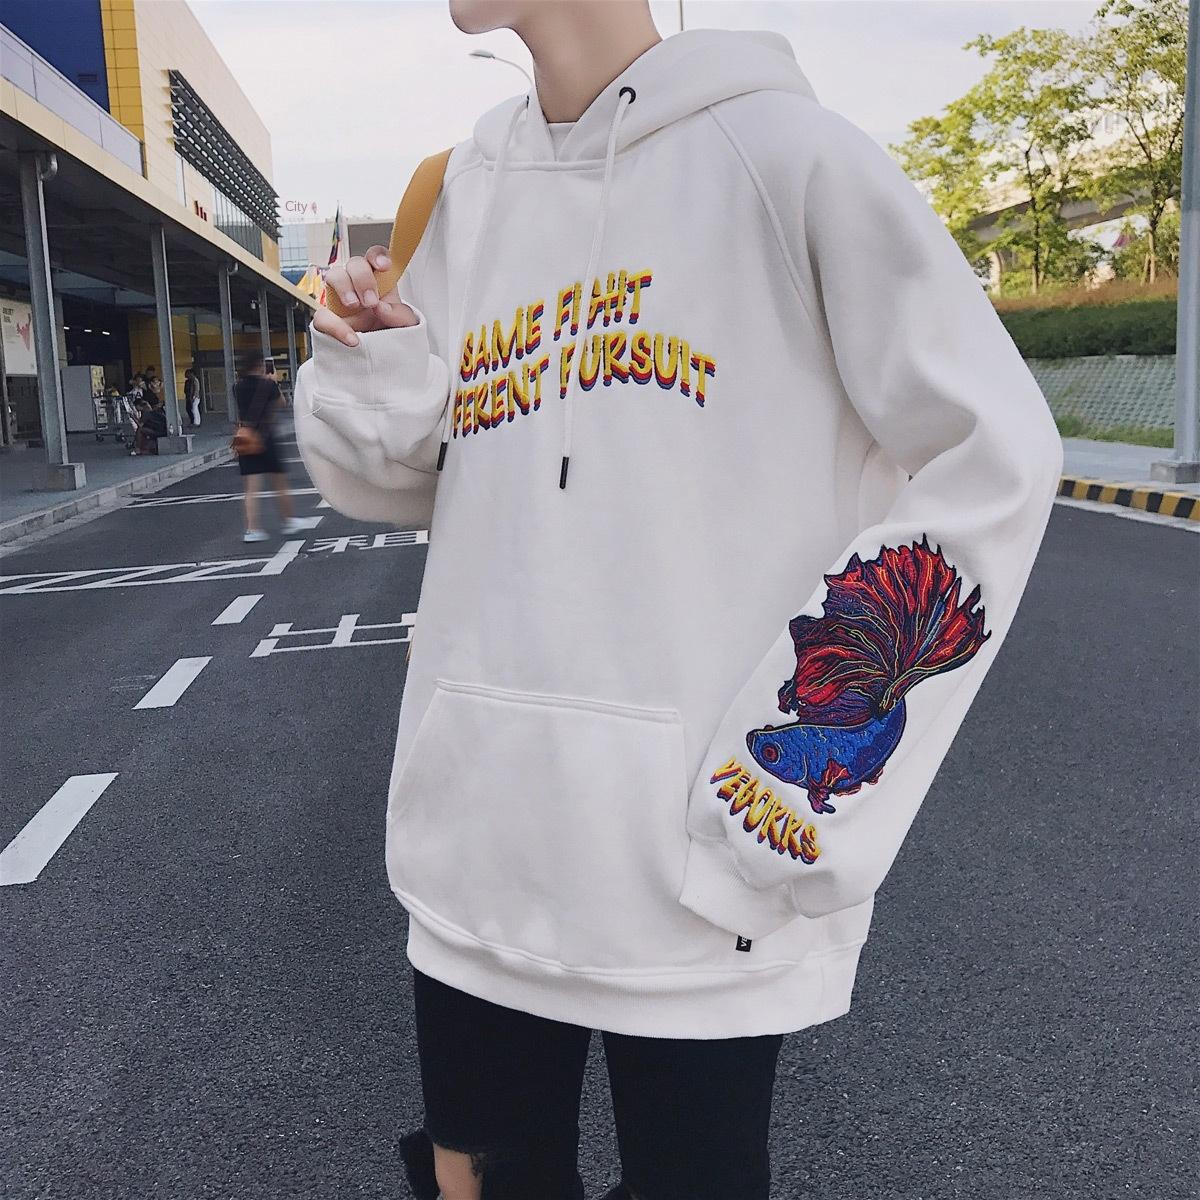 2020 Frühling paar beiläufige große Mantel Pullover Größe der chinesischen Art Harajuku Guchao bestickten Mantel Pullover Männer